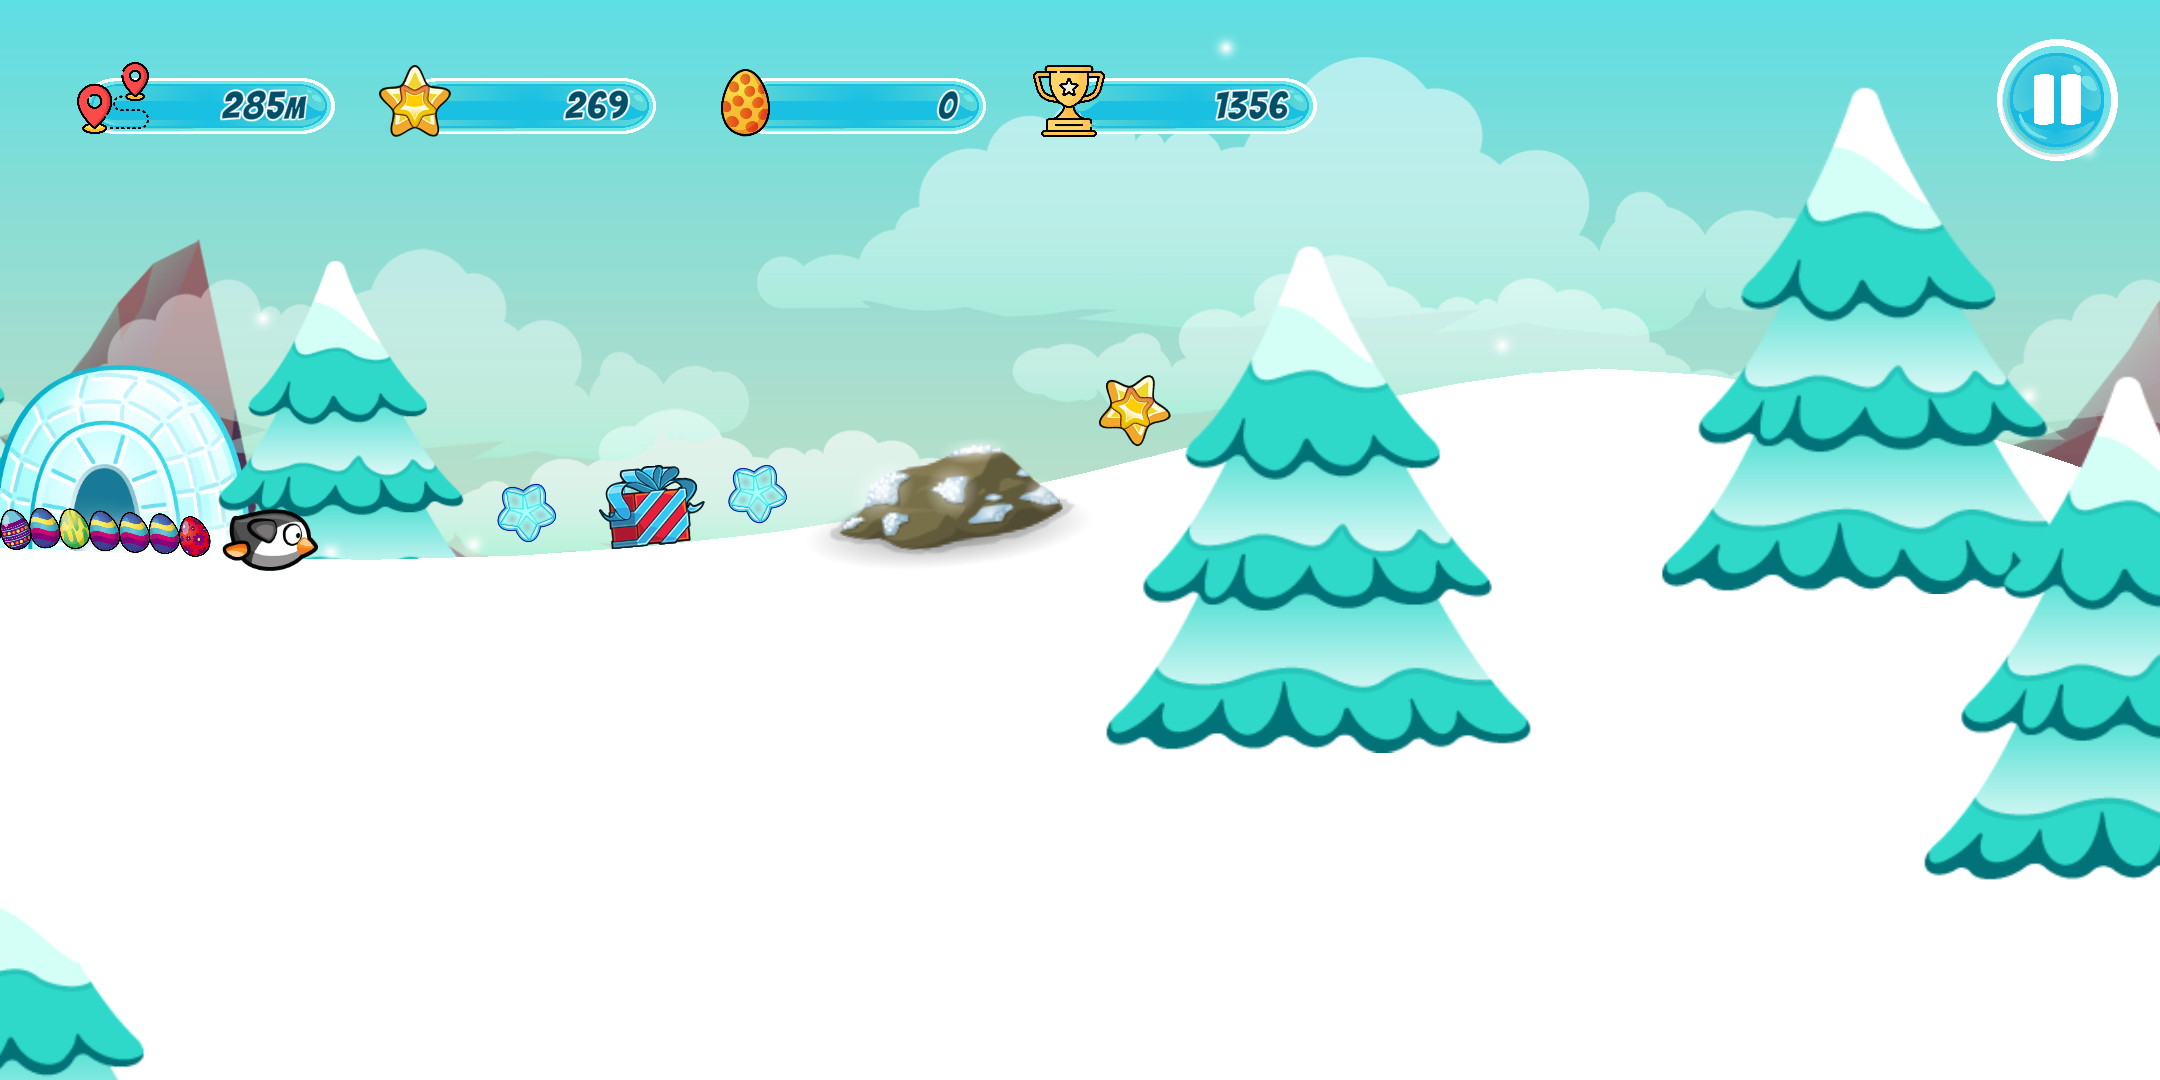 Screenshot 1: Pingo - the sliding penguin